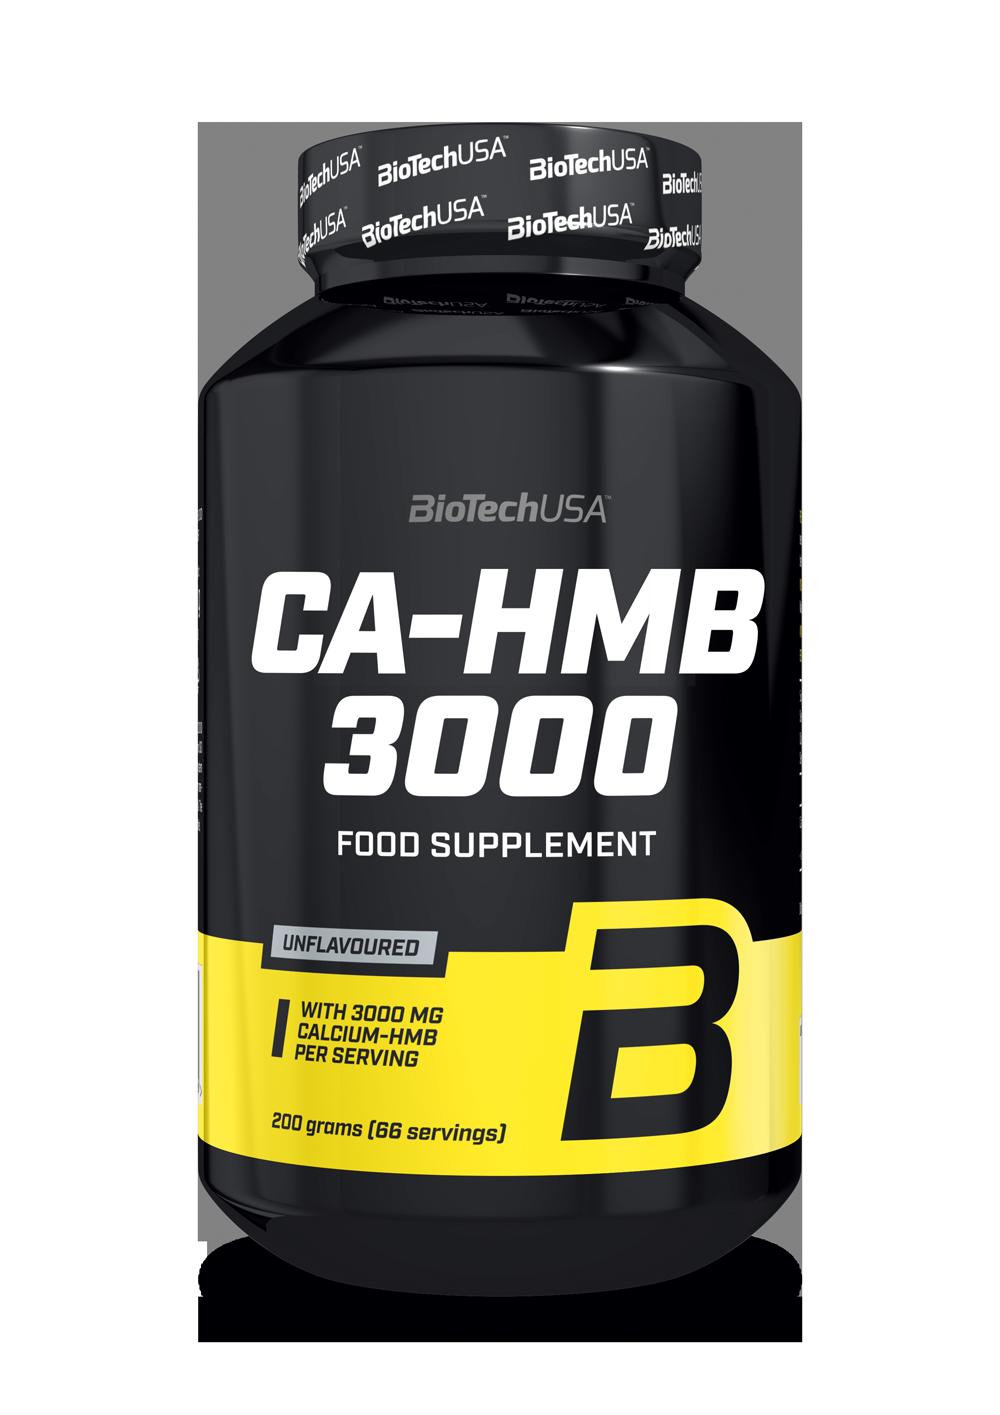 CA-HMB 3000 BioTech USA